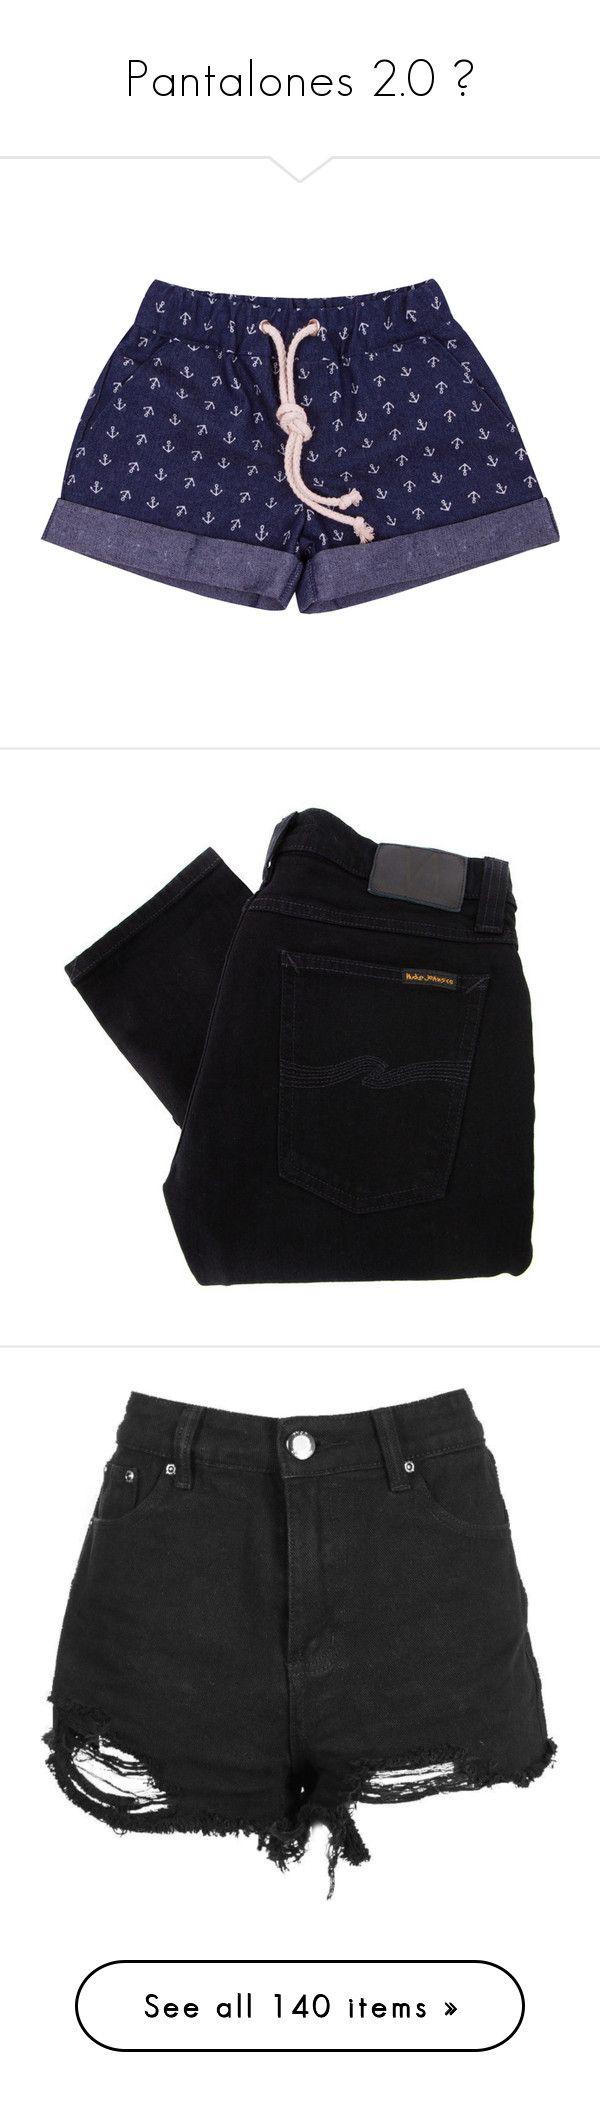 """Pantalones 2.0 💚"" by winimae ❤ liked on Polyvore featuring shorts, navy blue, short shorts, denim shorts, navy blue shorts, navy shorts, anchor shorts, jeans, pants and bottoms"